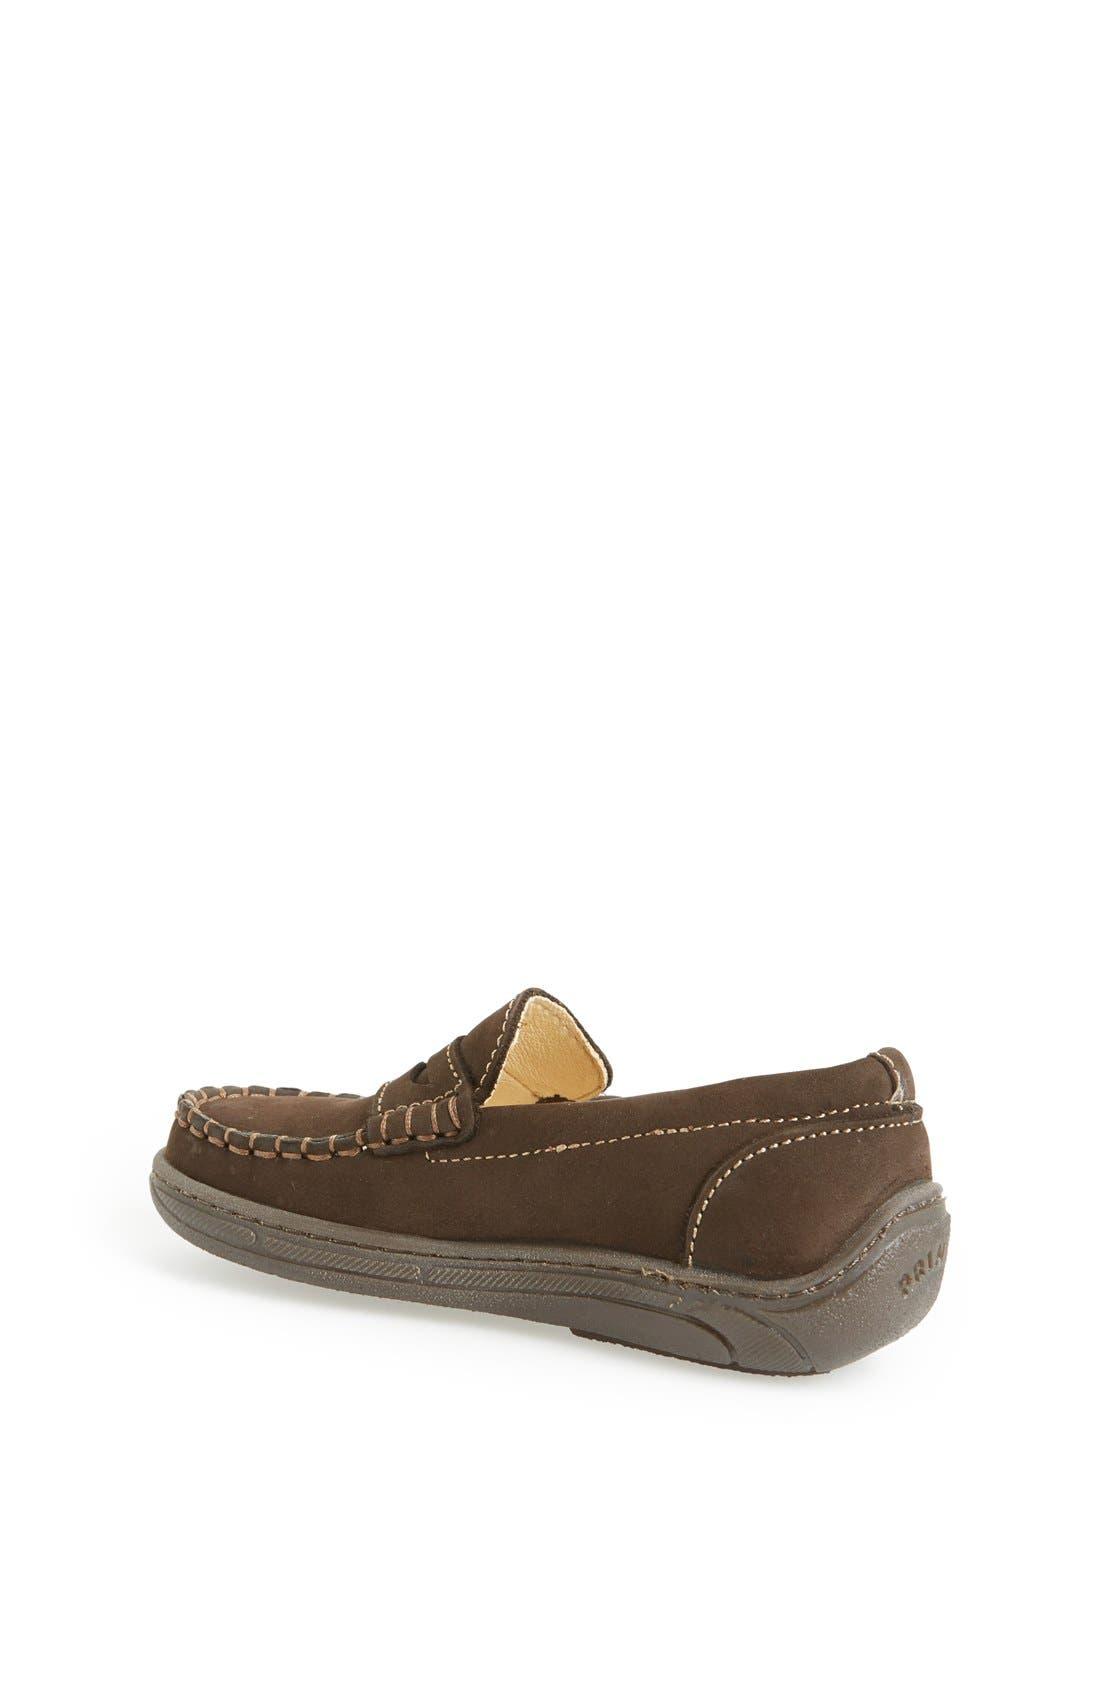 PRIMIGI,                             'Choate' Slip-On Loafer,                             Alternate thumbnail 4, color,                             210